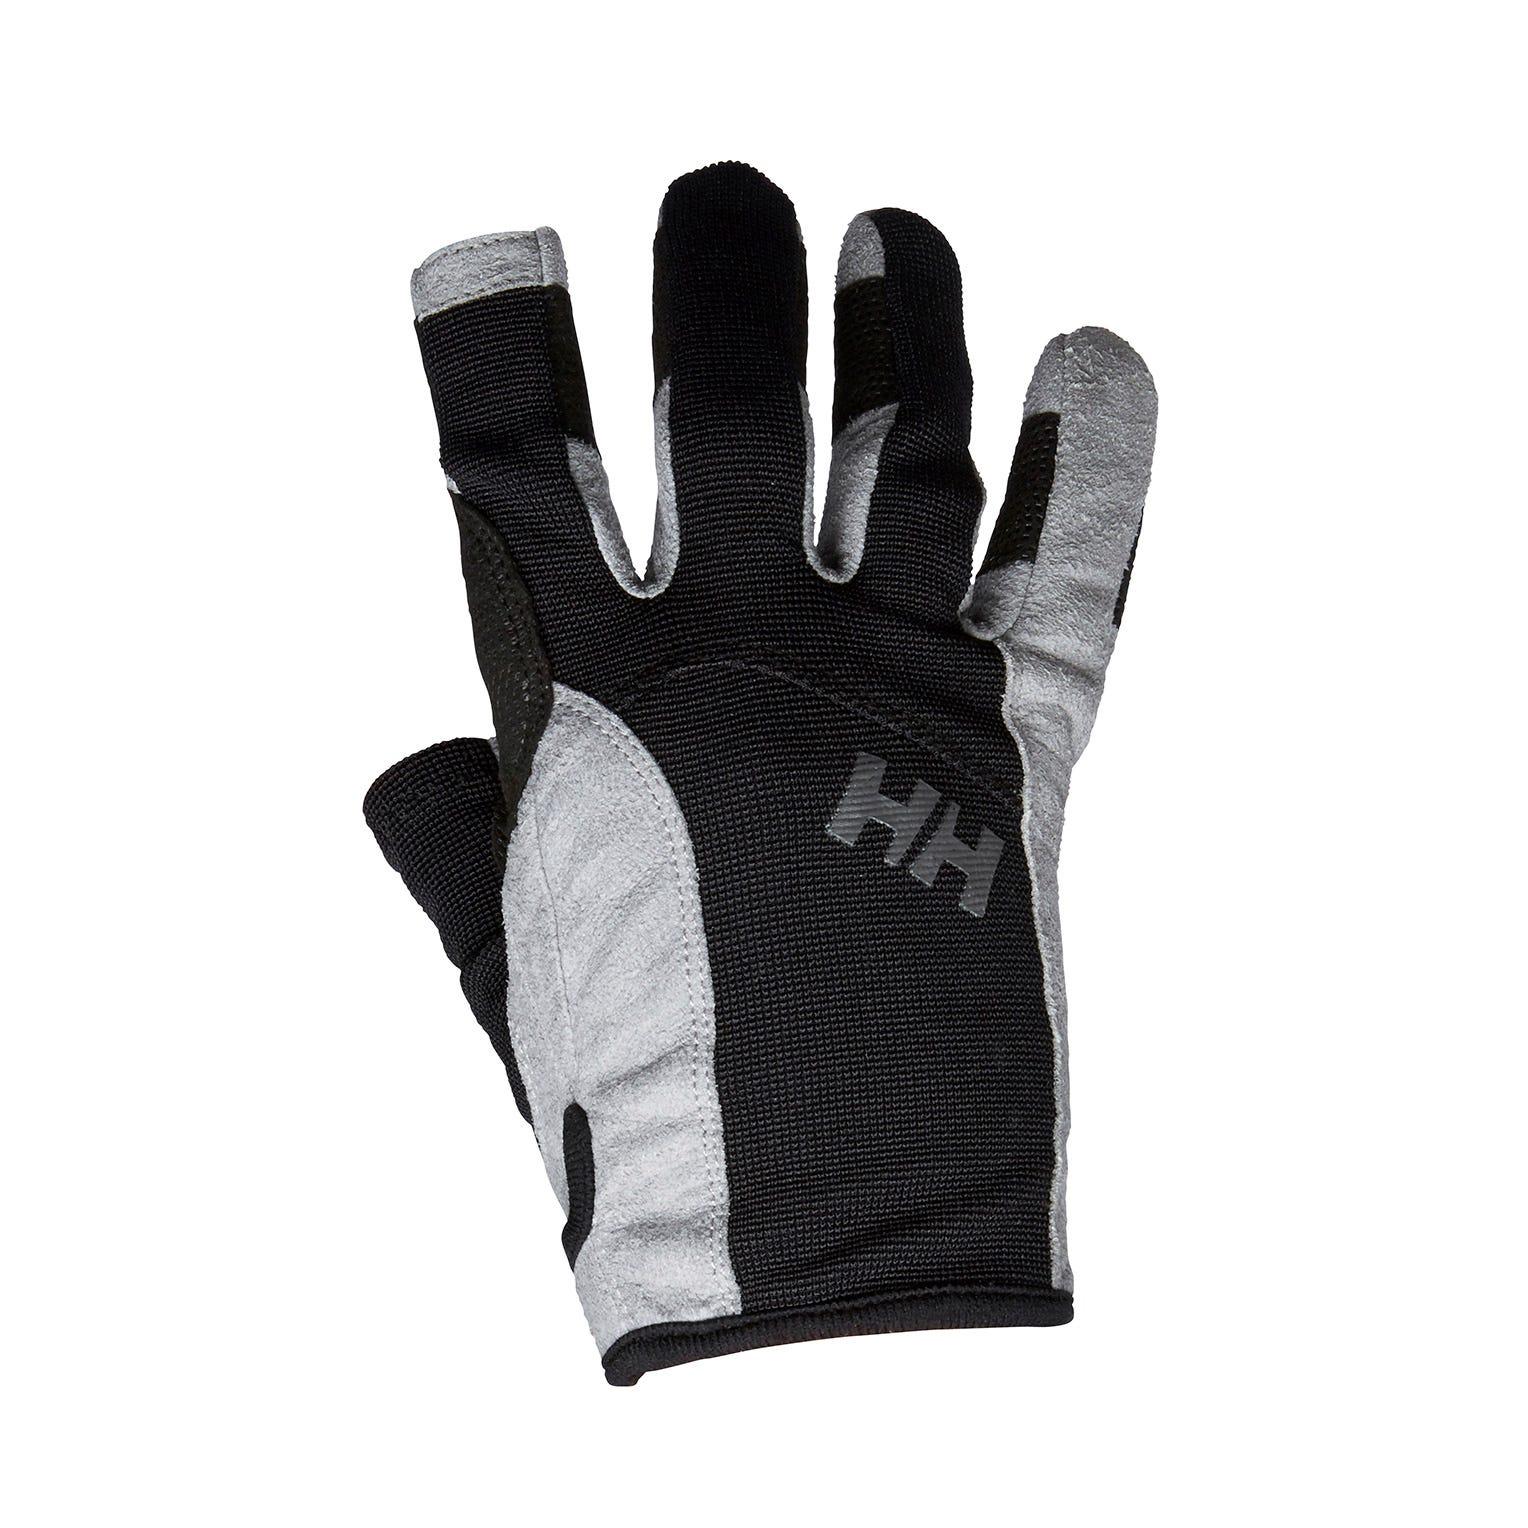 Helly Hansen Sailing Glove Long Black S